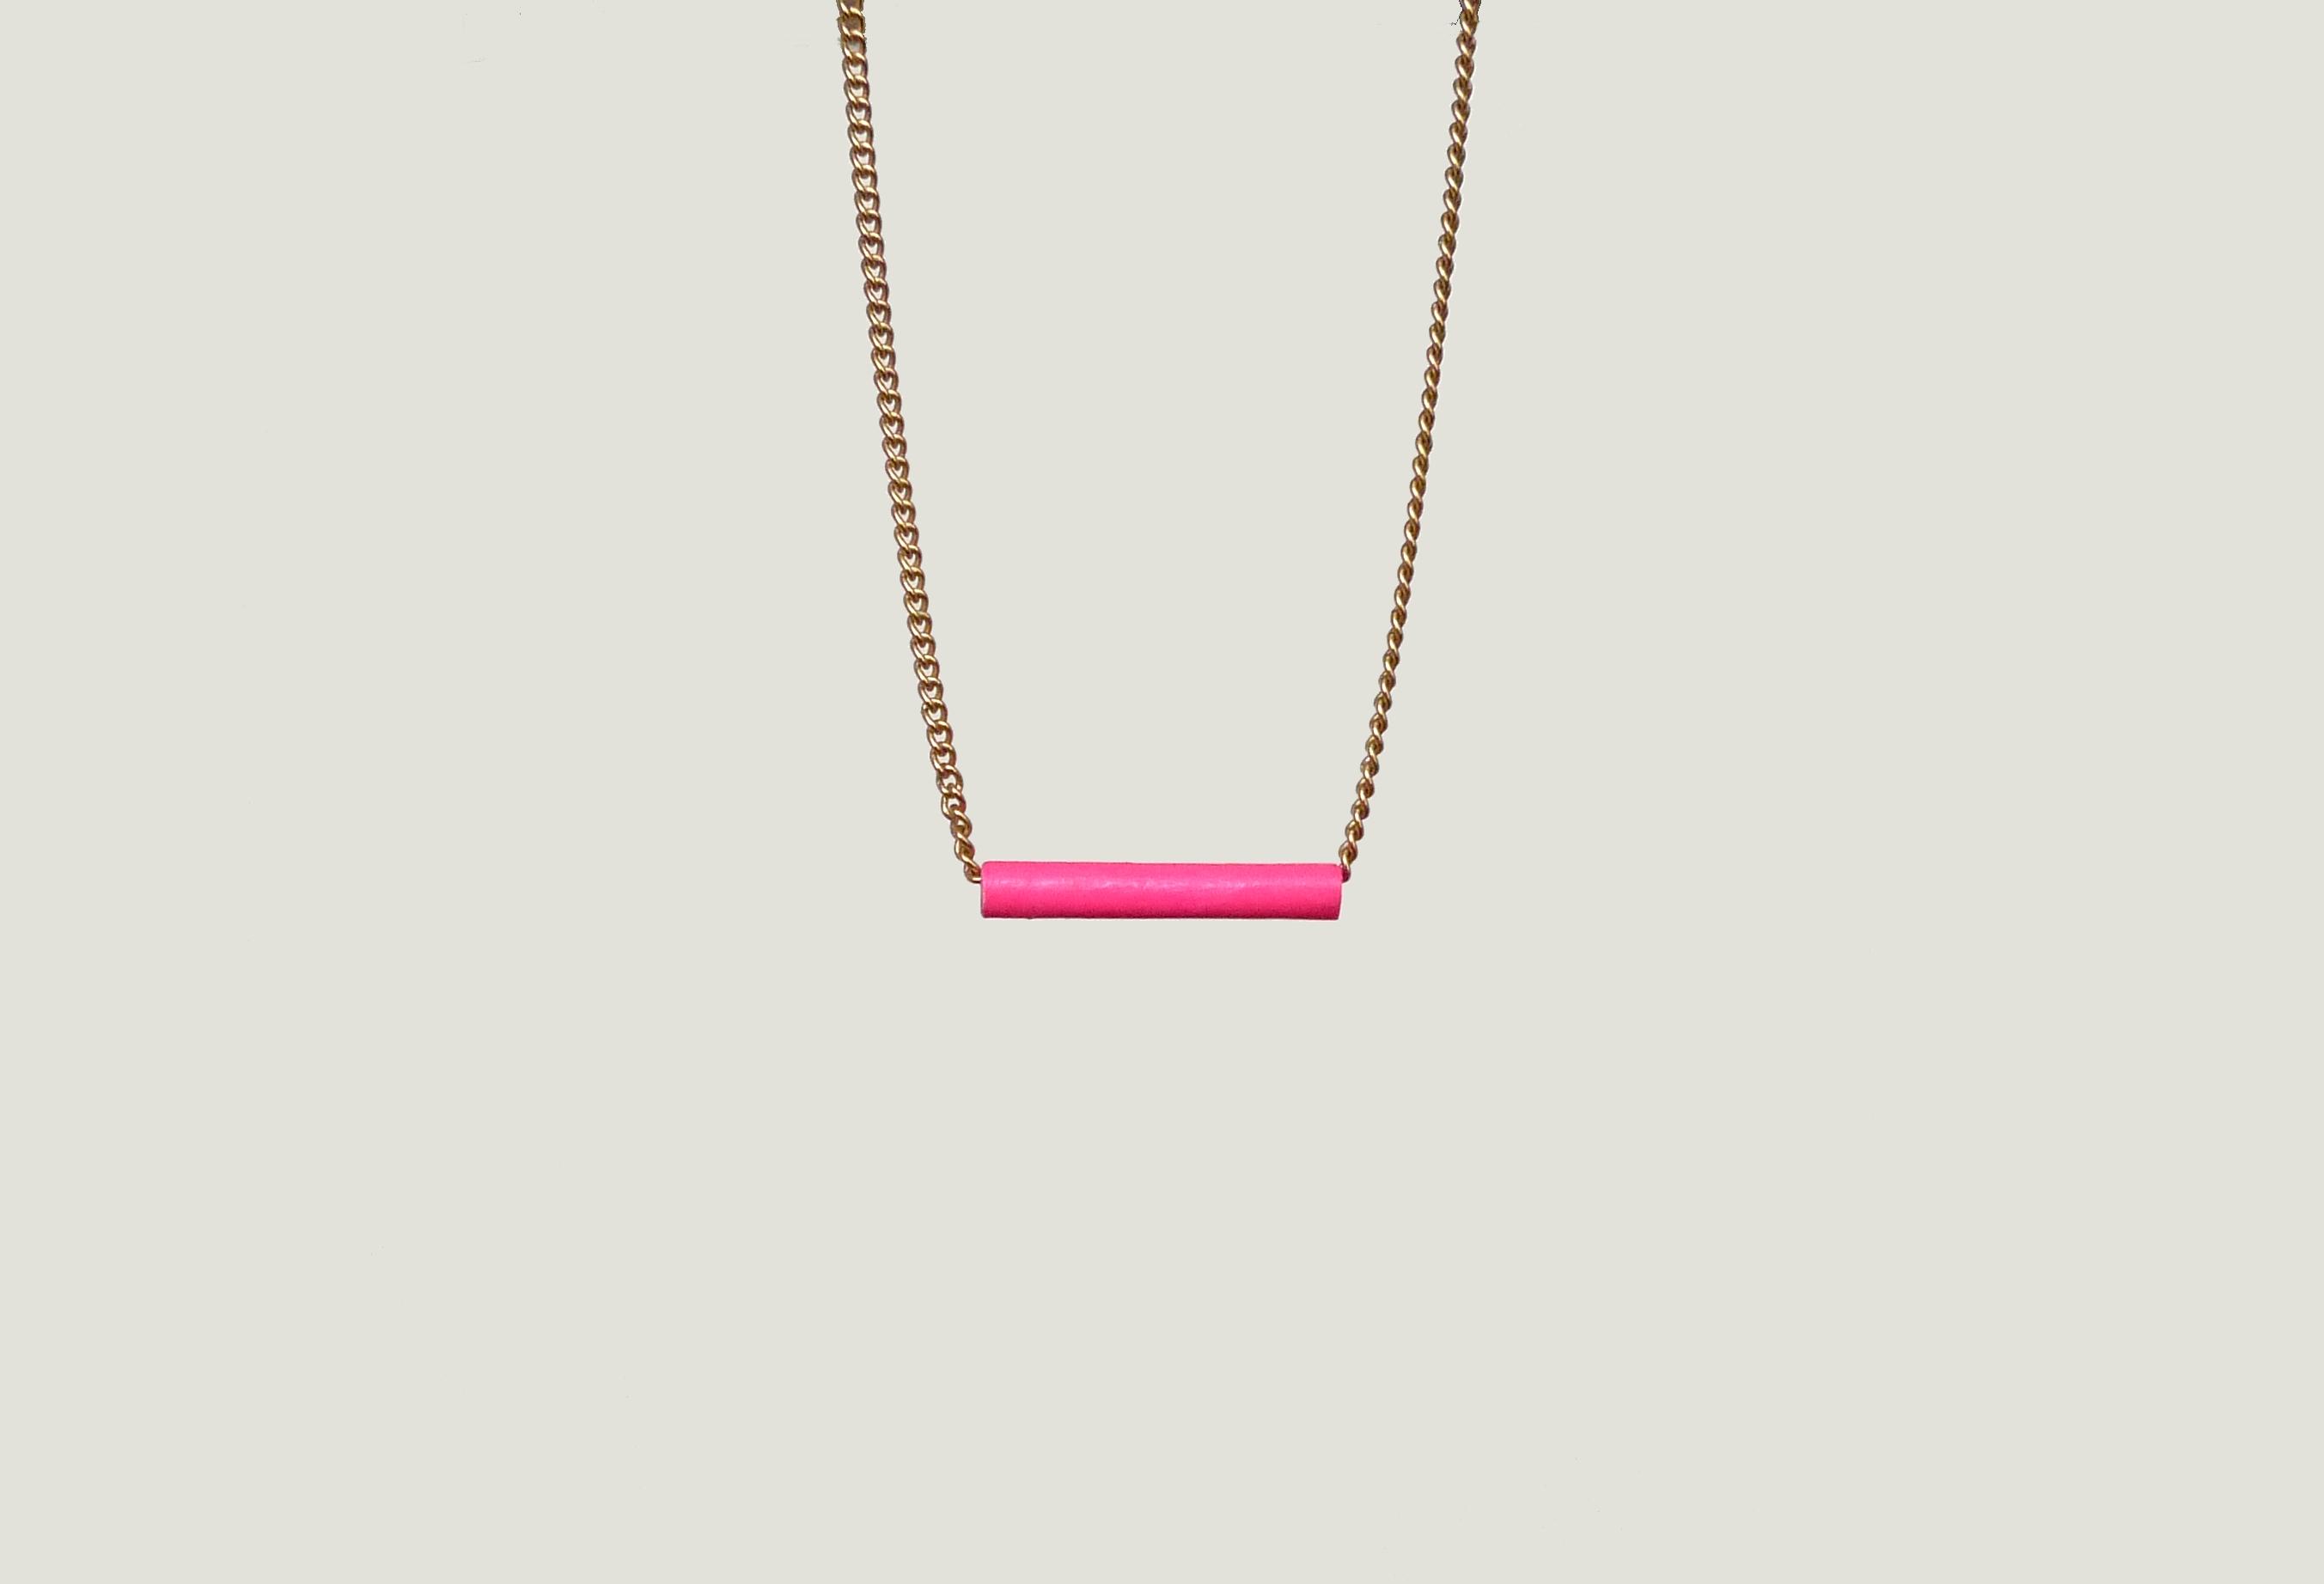 papierperle-kette-paperdesc-pink-2016